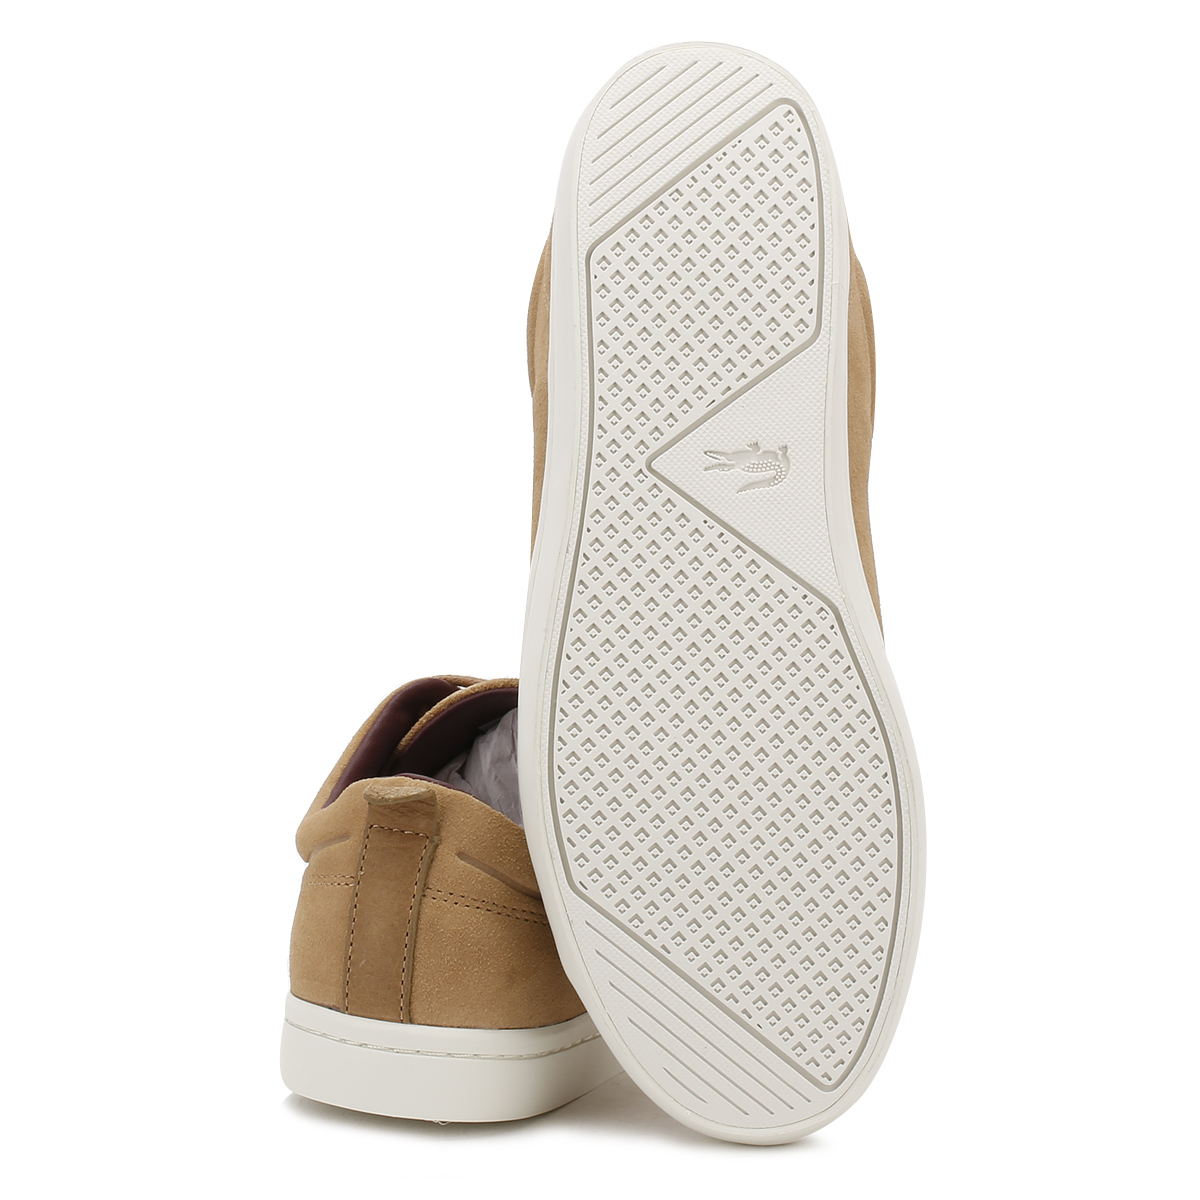 Lacoste para Hombre Tenis luz tan straightset 317 de Zapatos Deportivos Informales de 317 Gamuza 3 19e0c9